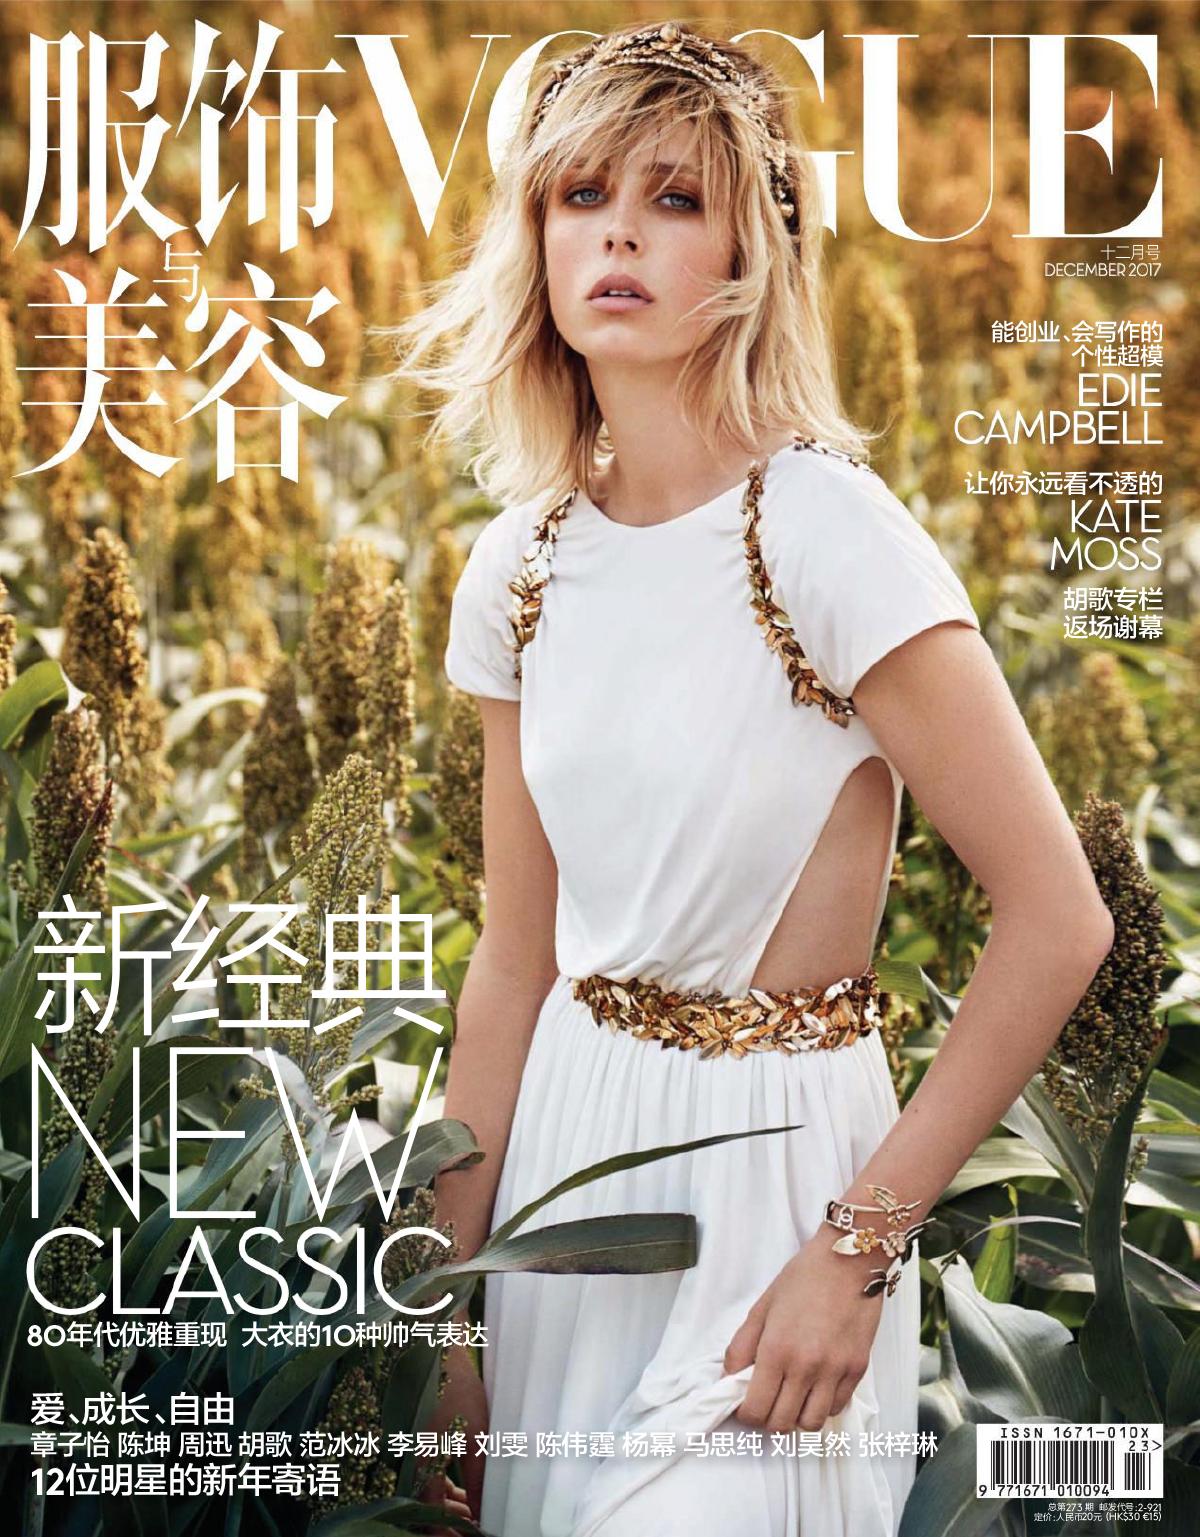 Edie-Campbell-Patrick-Demarchelier-Vogue-China-Dec-2017- (1).jpg